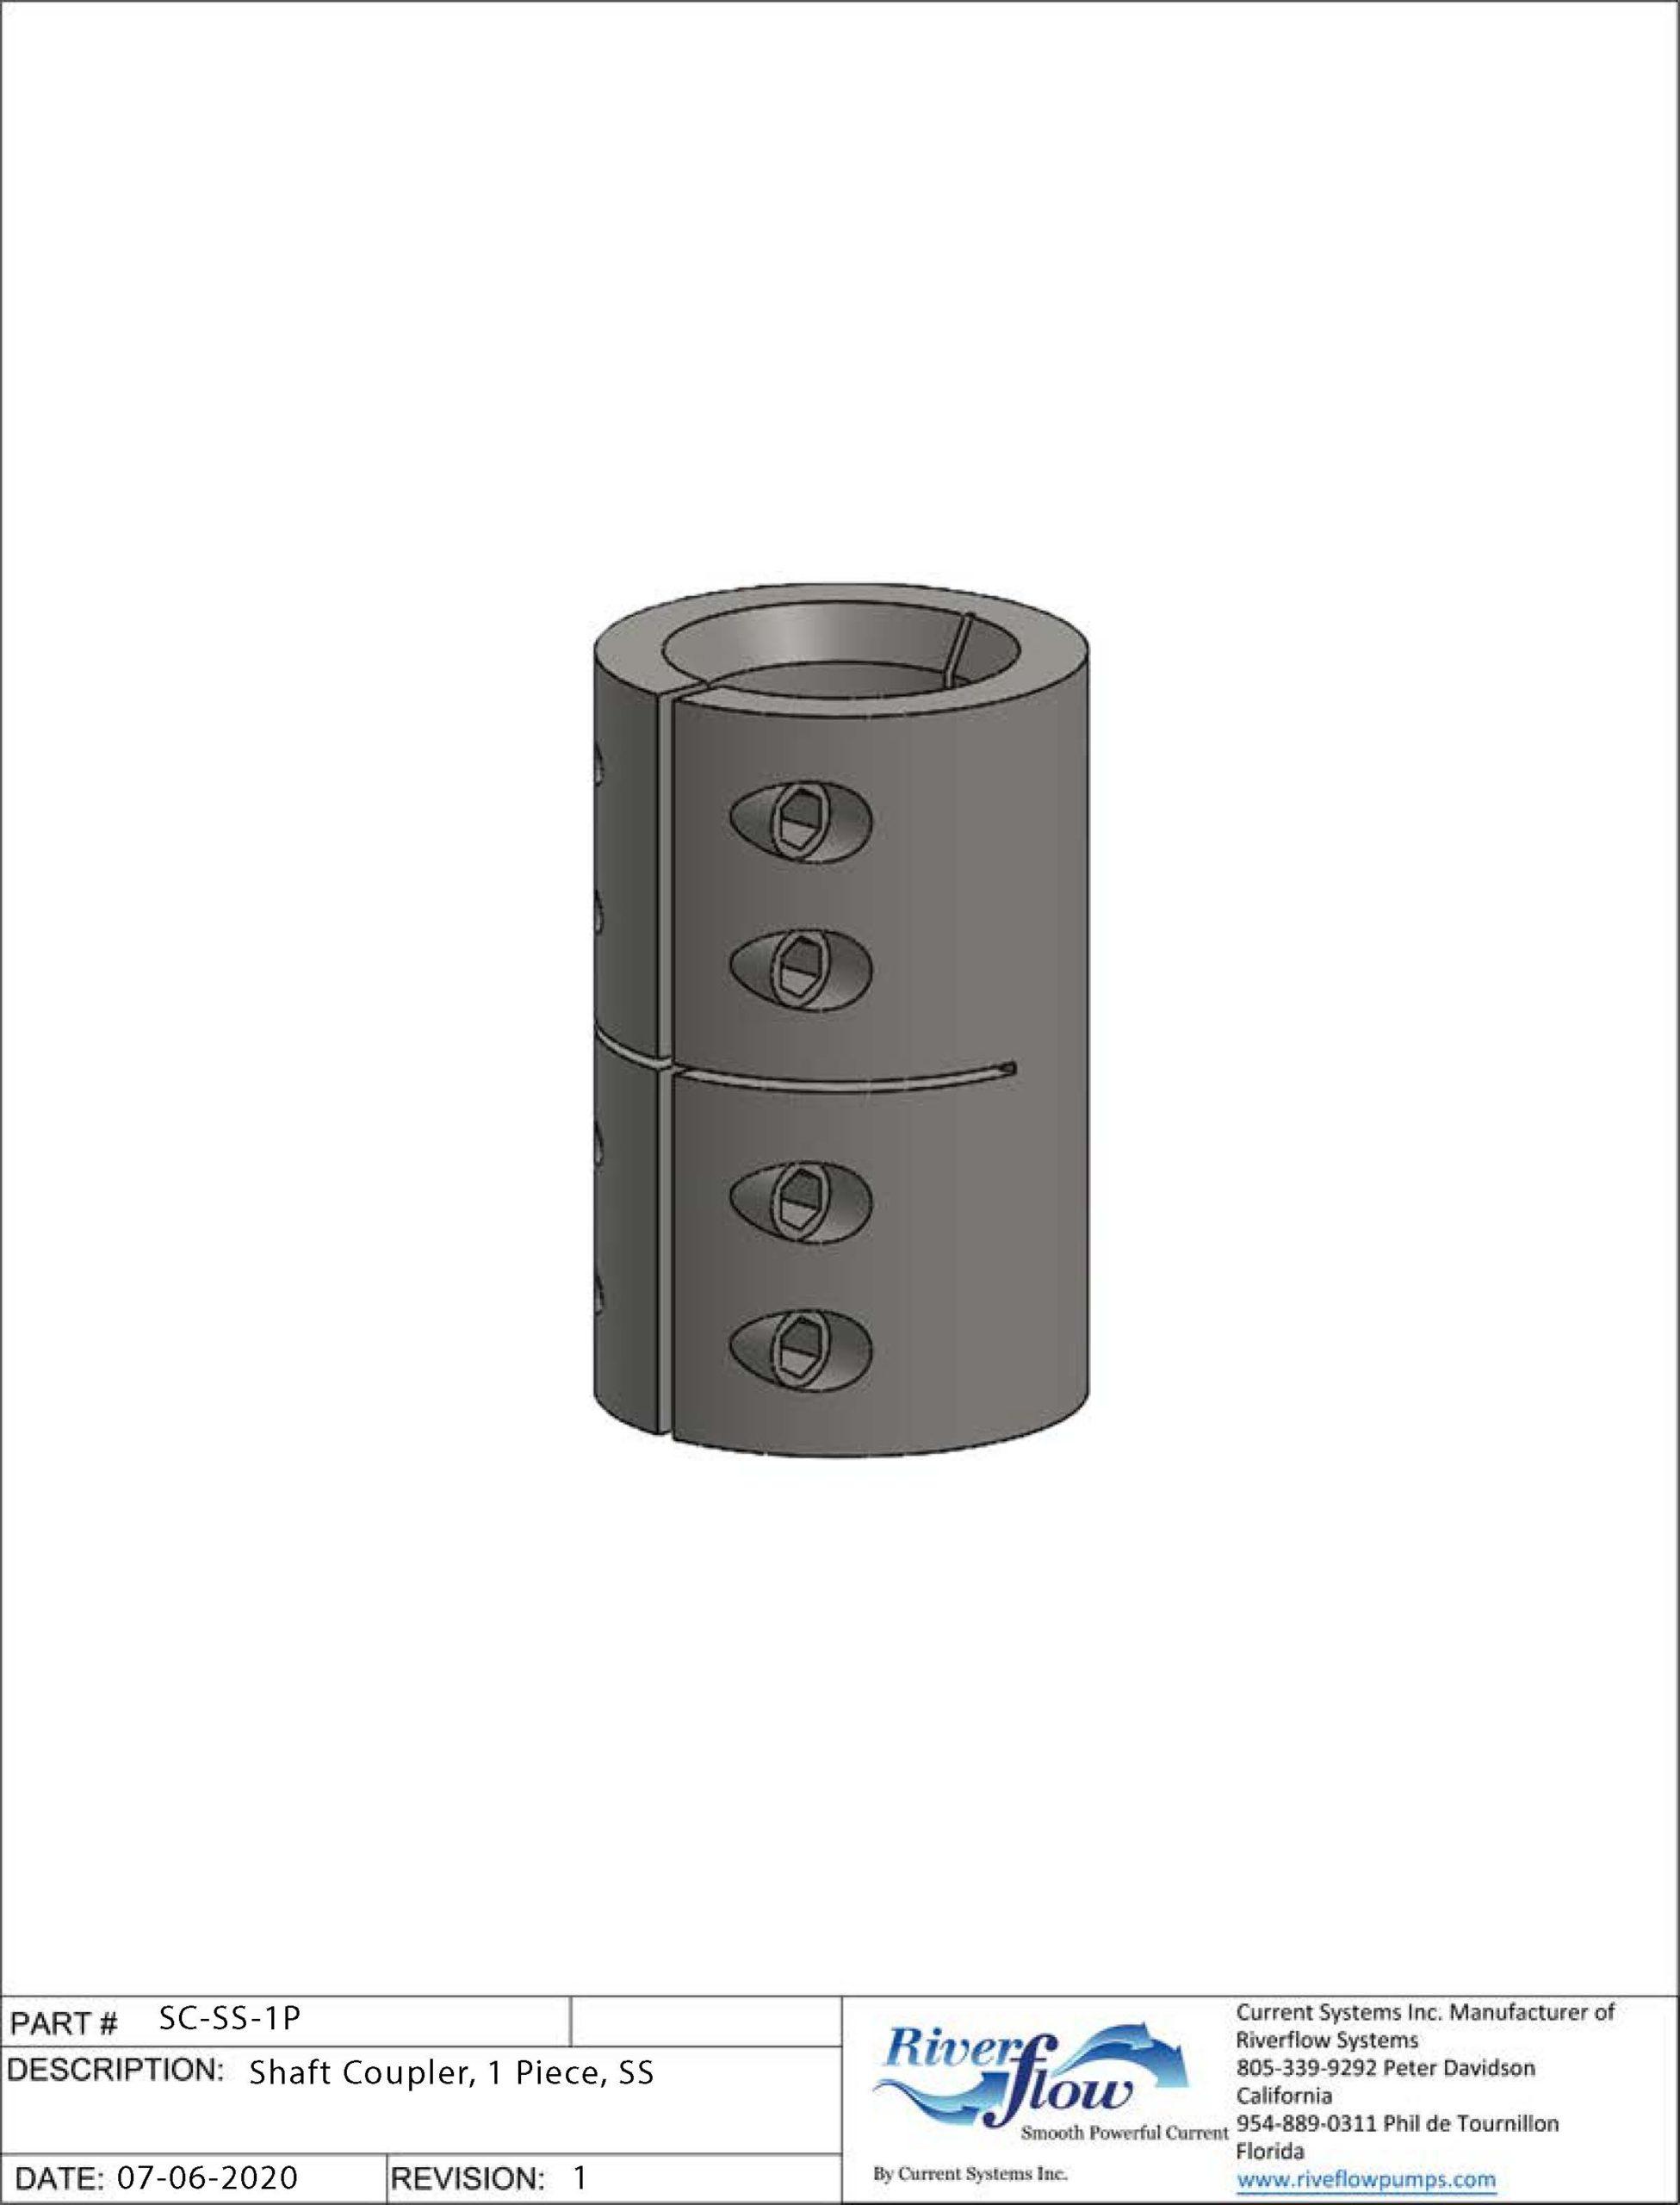 PN#: SC-SS-1P  Shaft Coupler, 1 Piece, SS